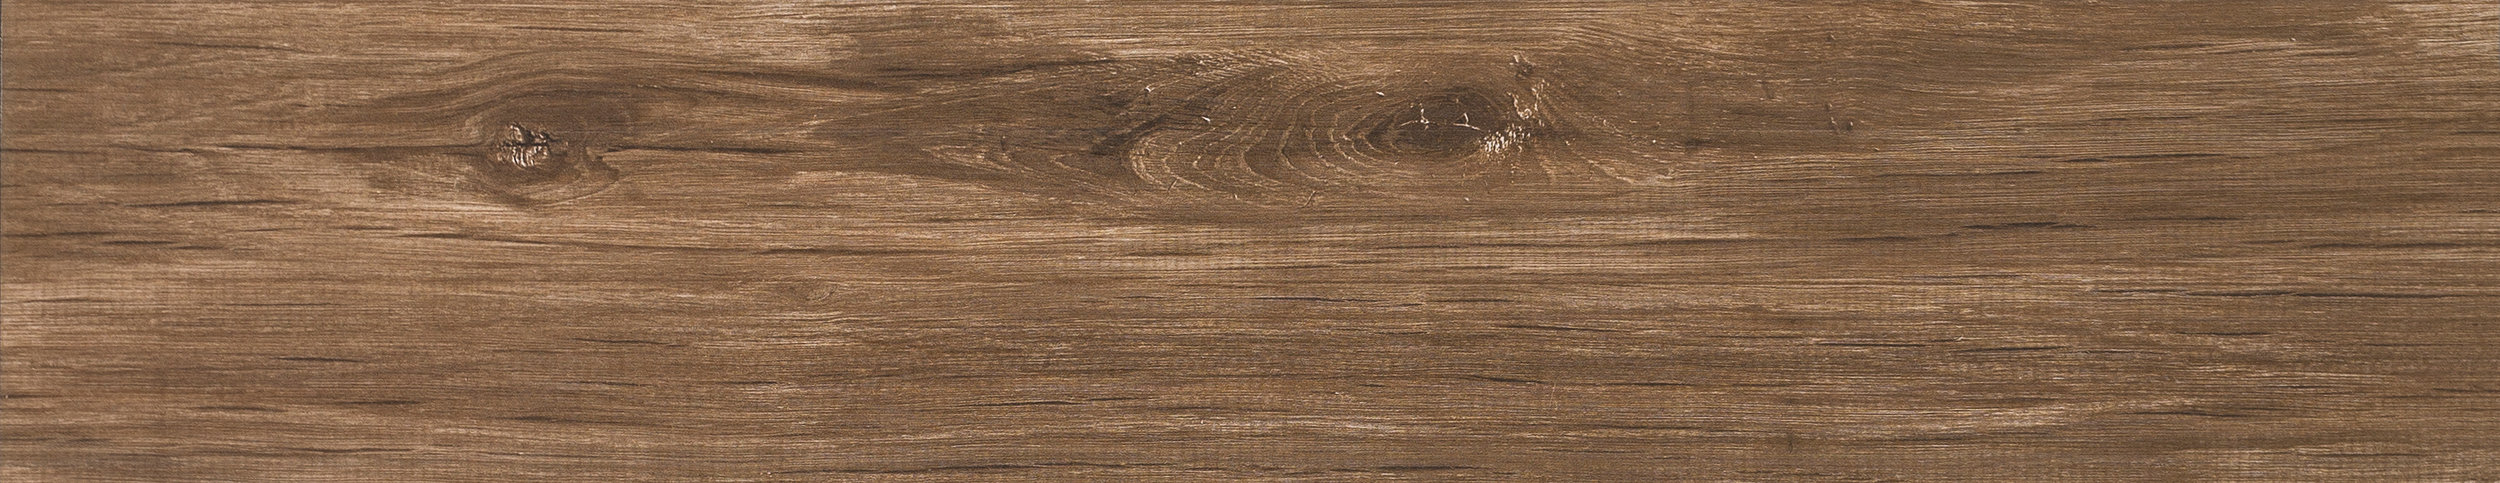 "log wood 6.5"" x 39.25"" nut"